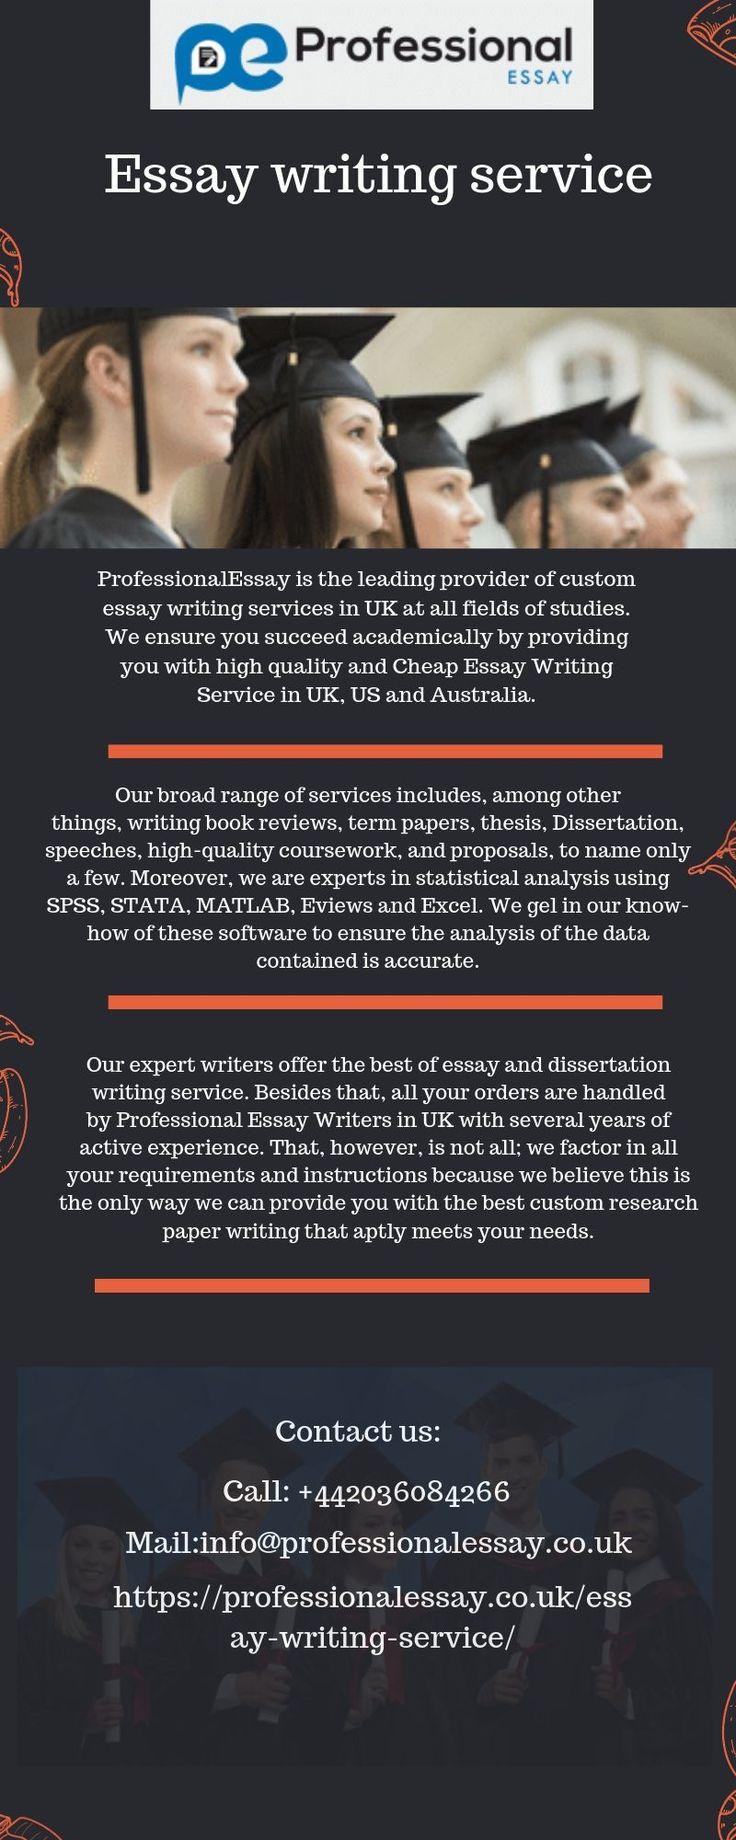 Best free essay writing service